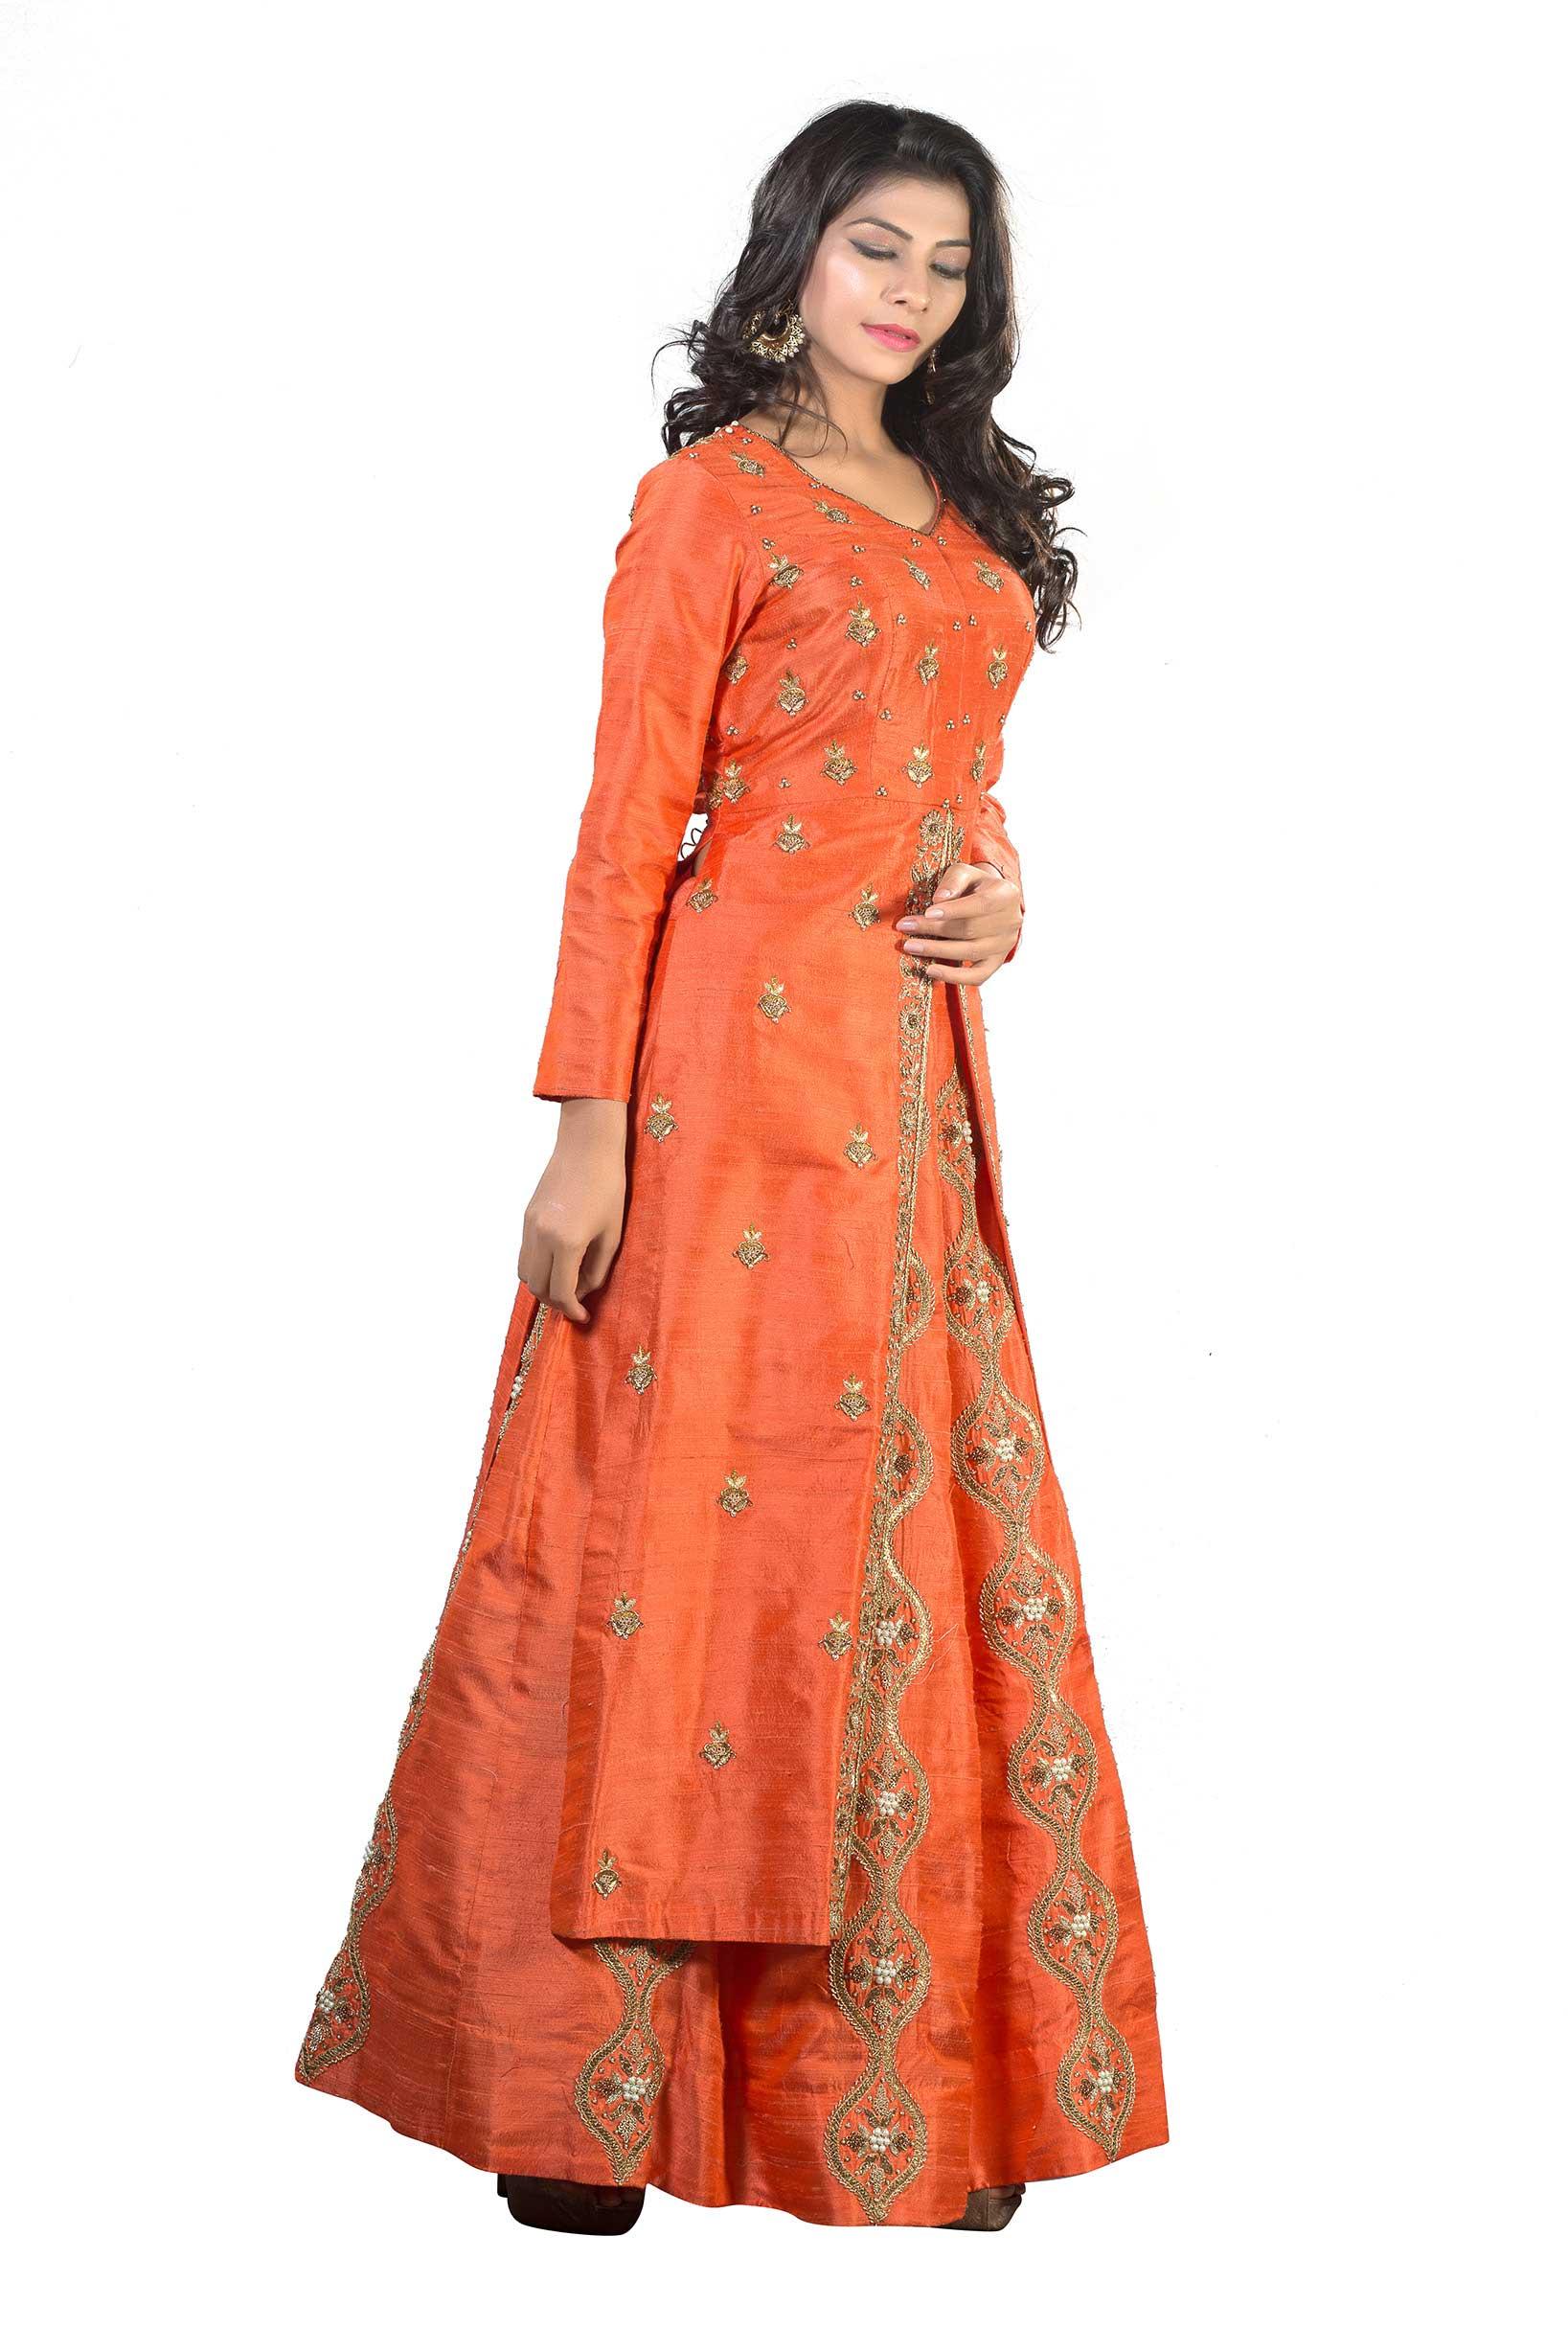 fa591ad704f26 Orange Raw Silk Long Top With Skirt And Dupatta With Zardosi Work